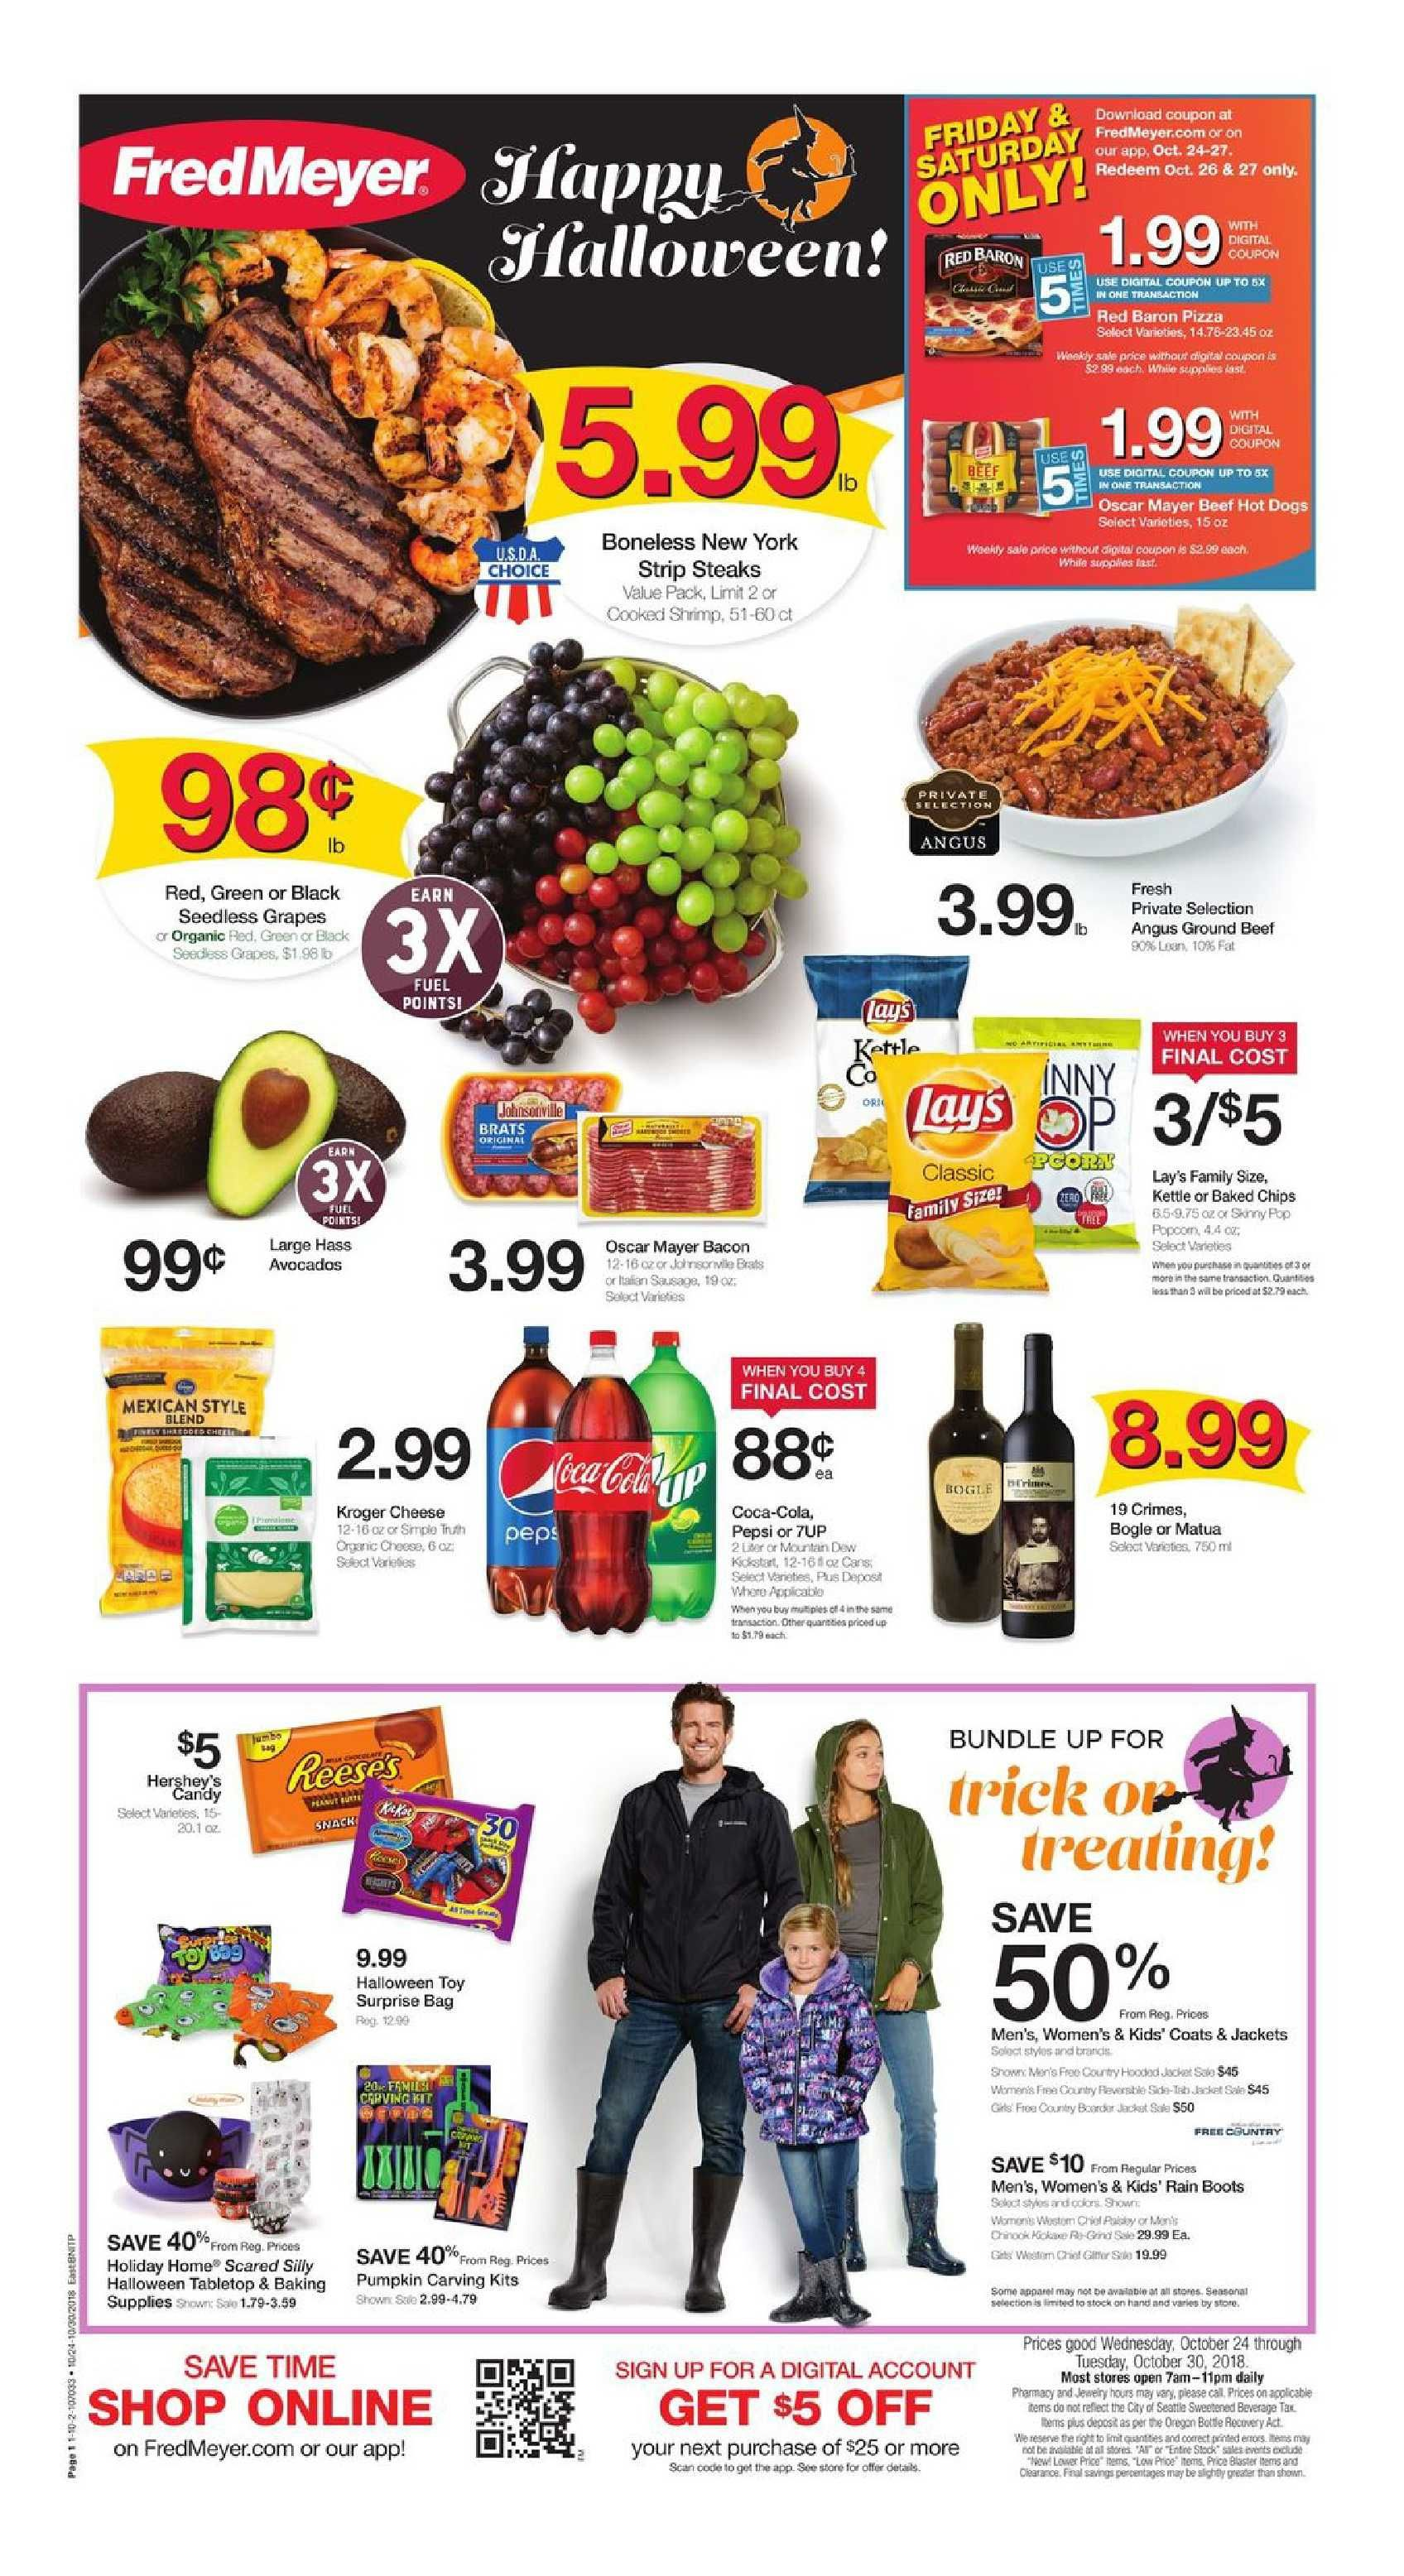 Fred Meyer Weekly Ad Flyer Mar 11 Mar 17 2020 Weeklyad123 Com